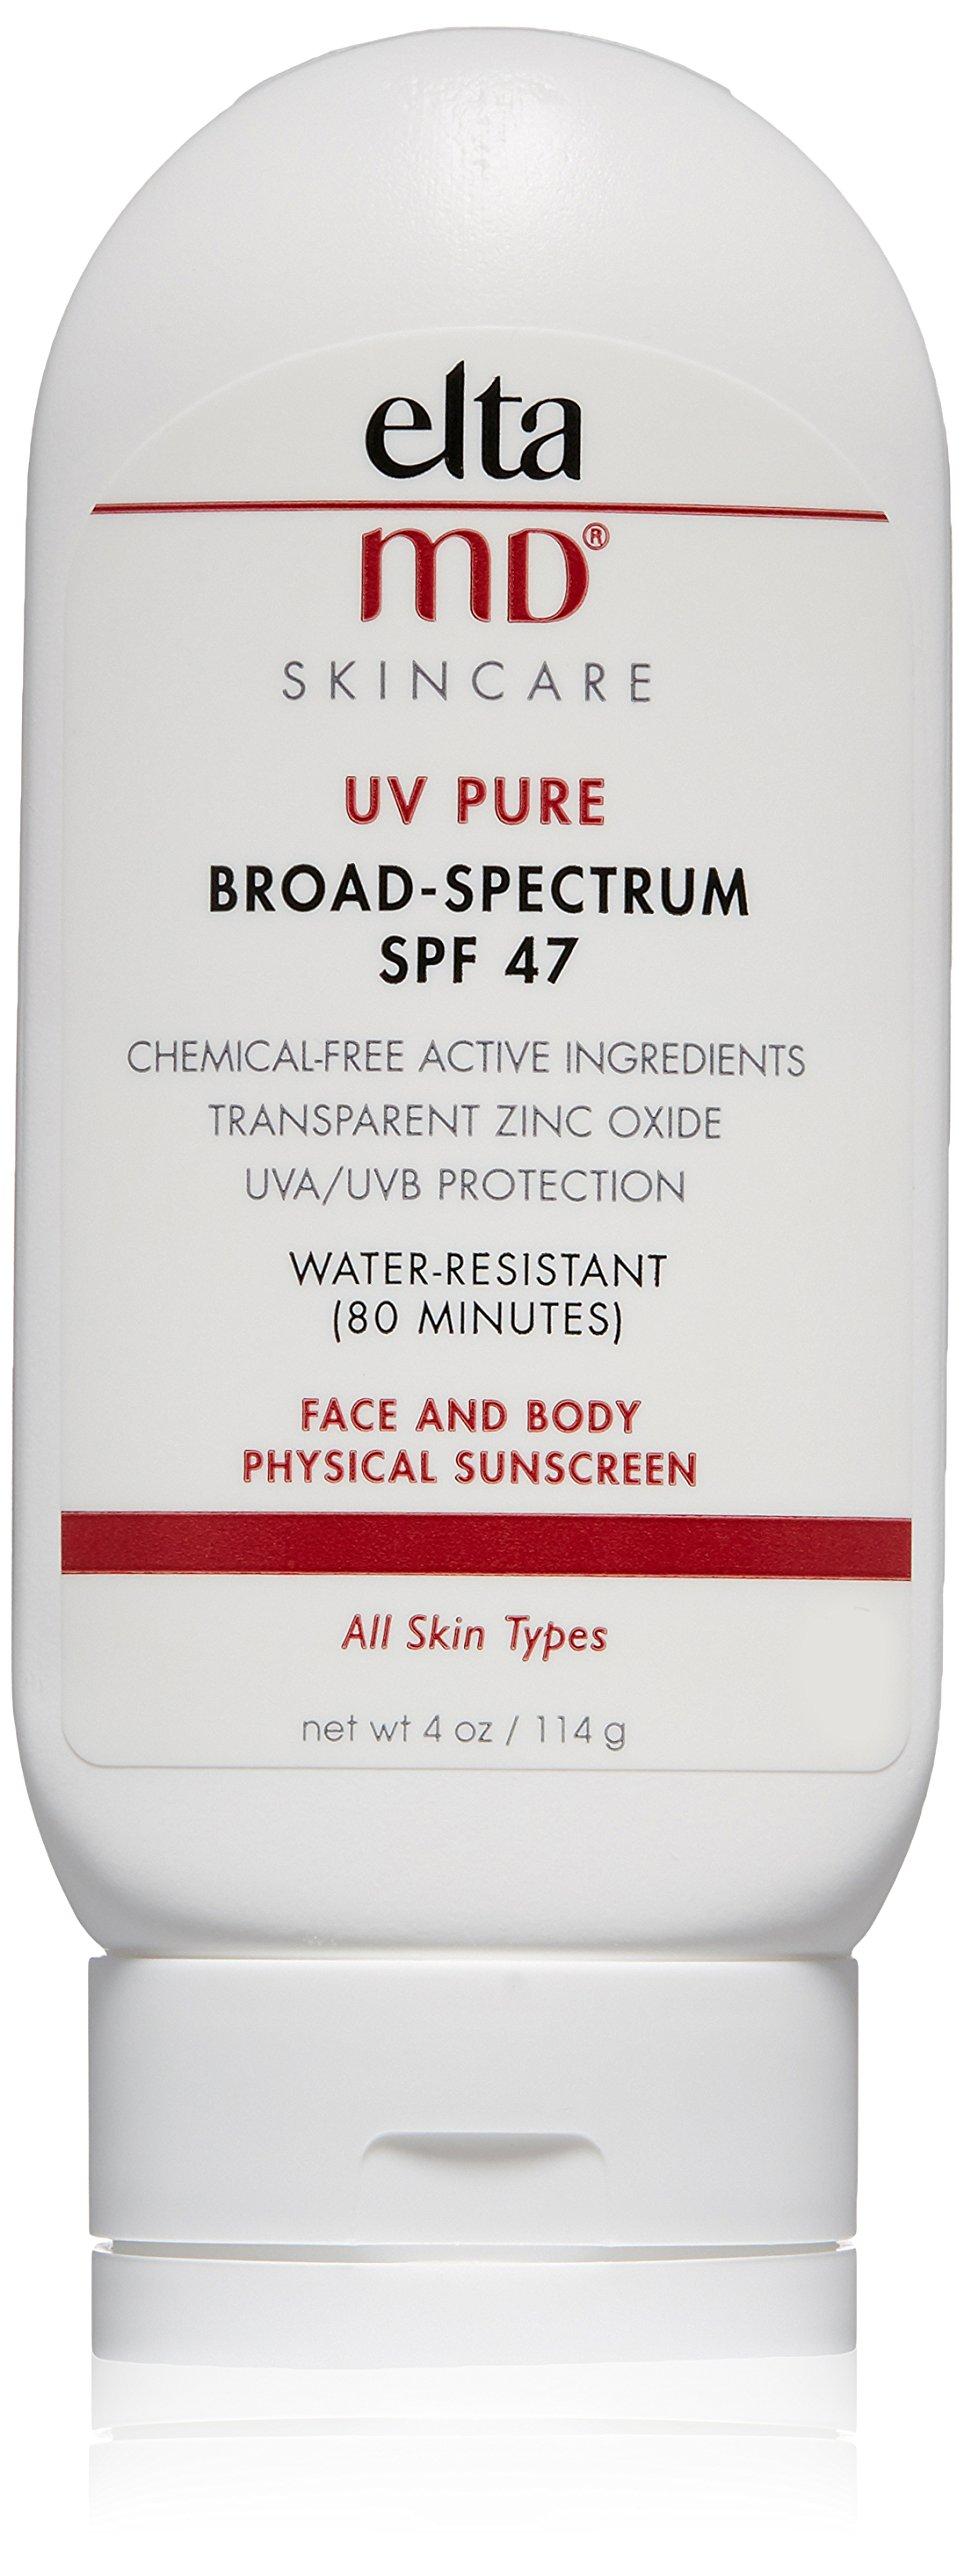 EltaMD UV Pure Sunscreen Broad-Spectrum SPF 47, Water-Resistant, Oil-free, 4.0 oz